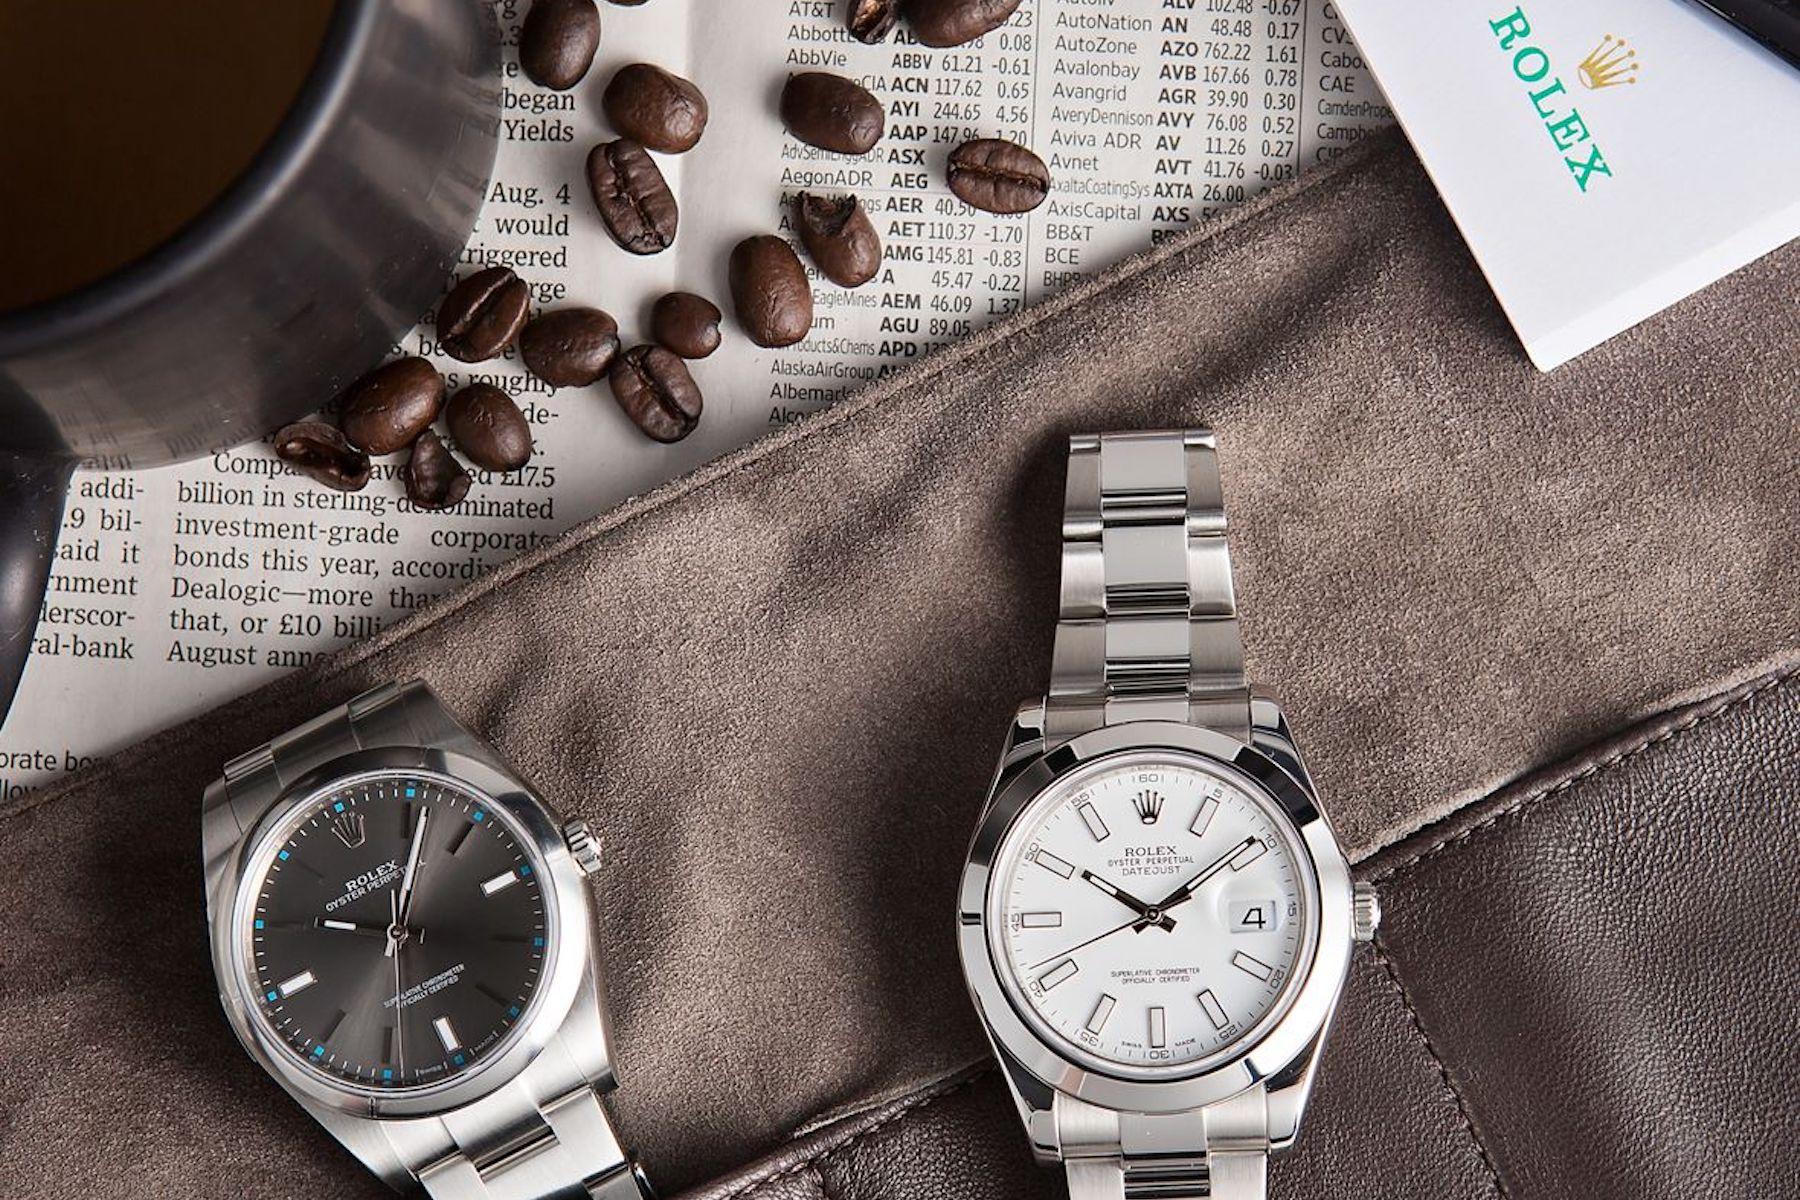 Scotland's 'Rolex Deliveroo' Service Perfect For Australia's Luxury Lockdown Woes